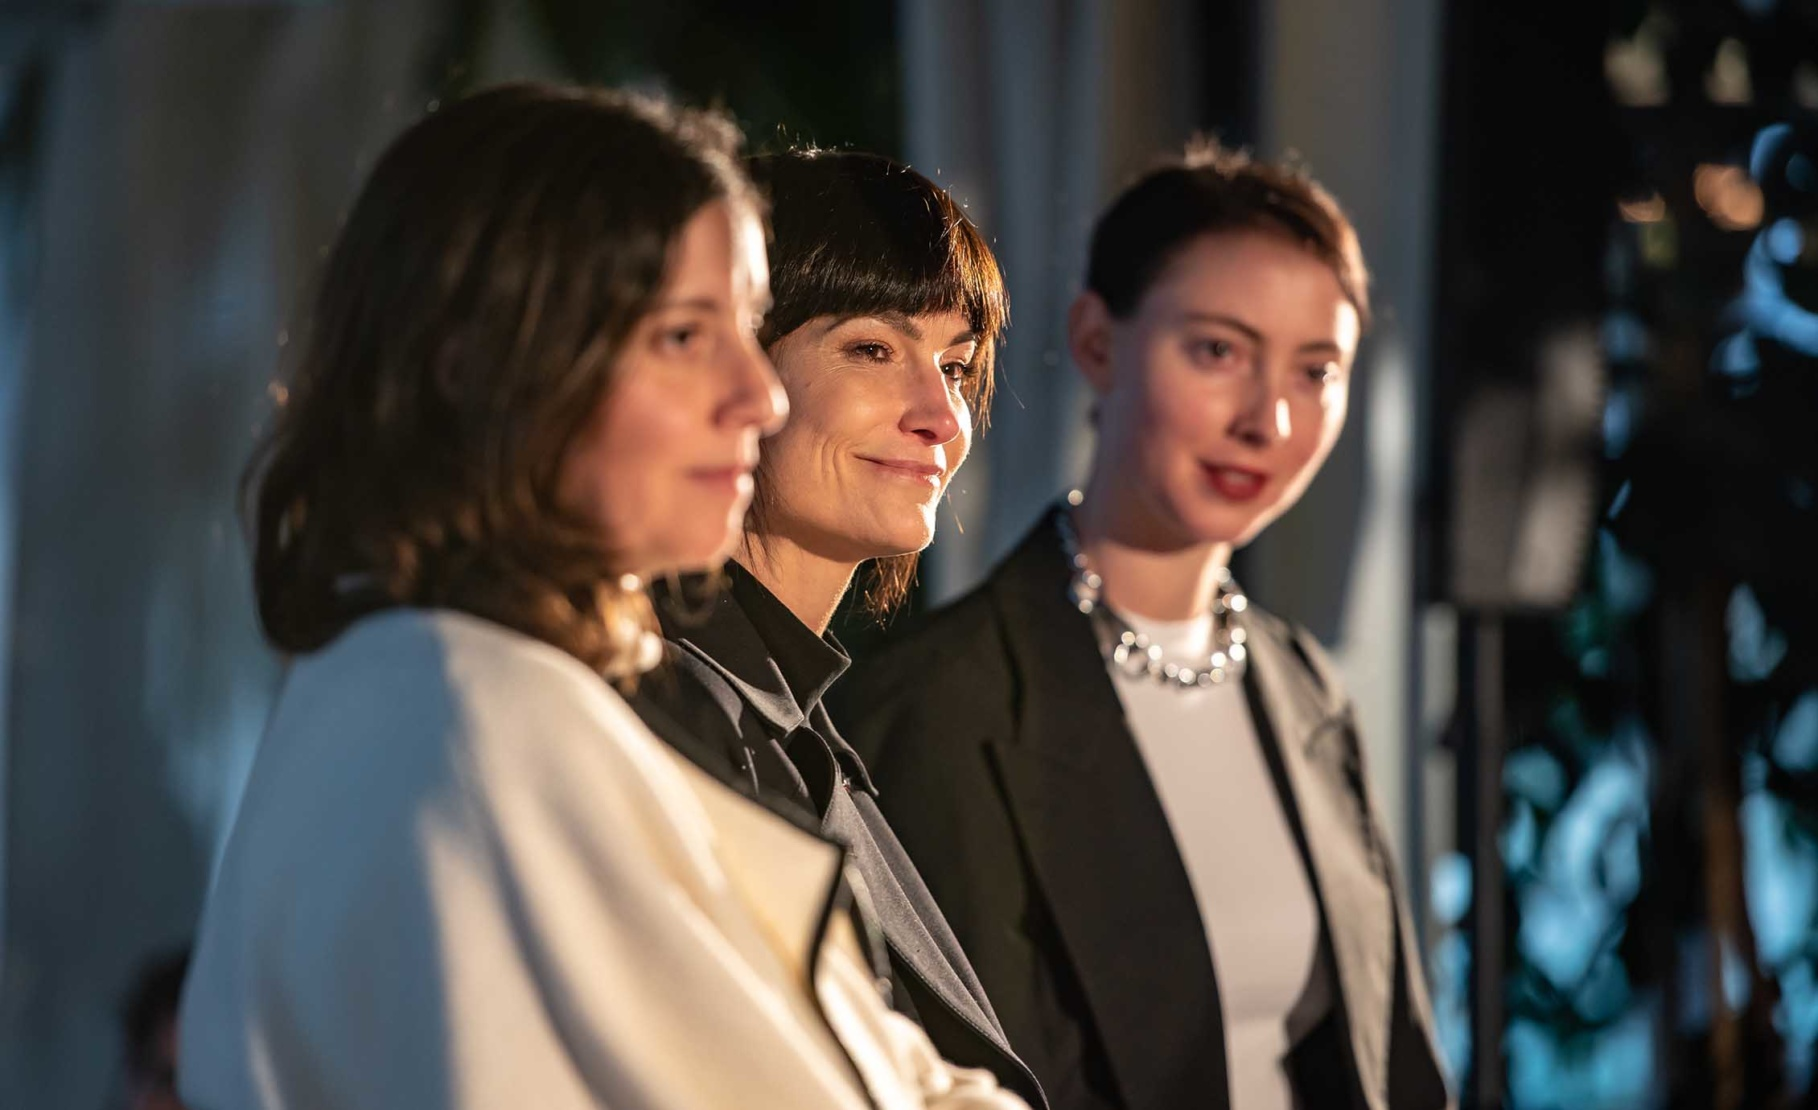 From left:Analia Saban, Rosetta Getty and Hayden Dunham